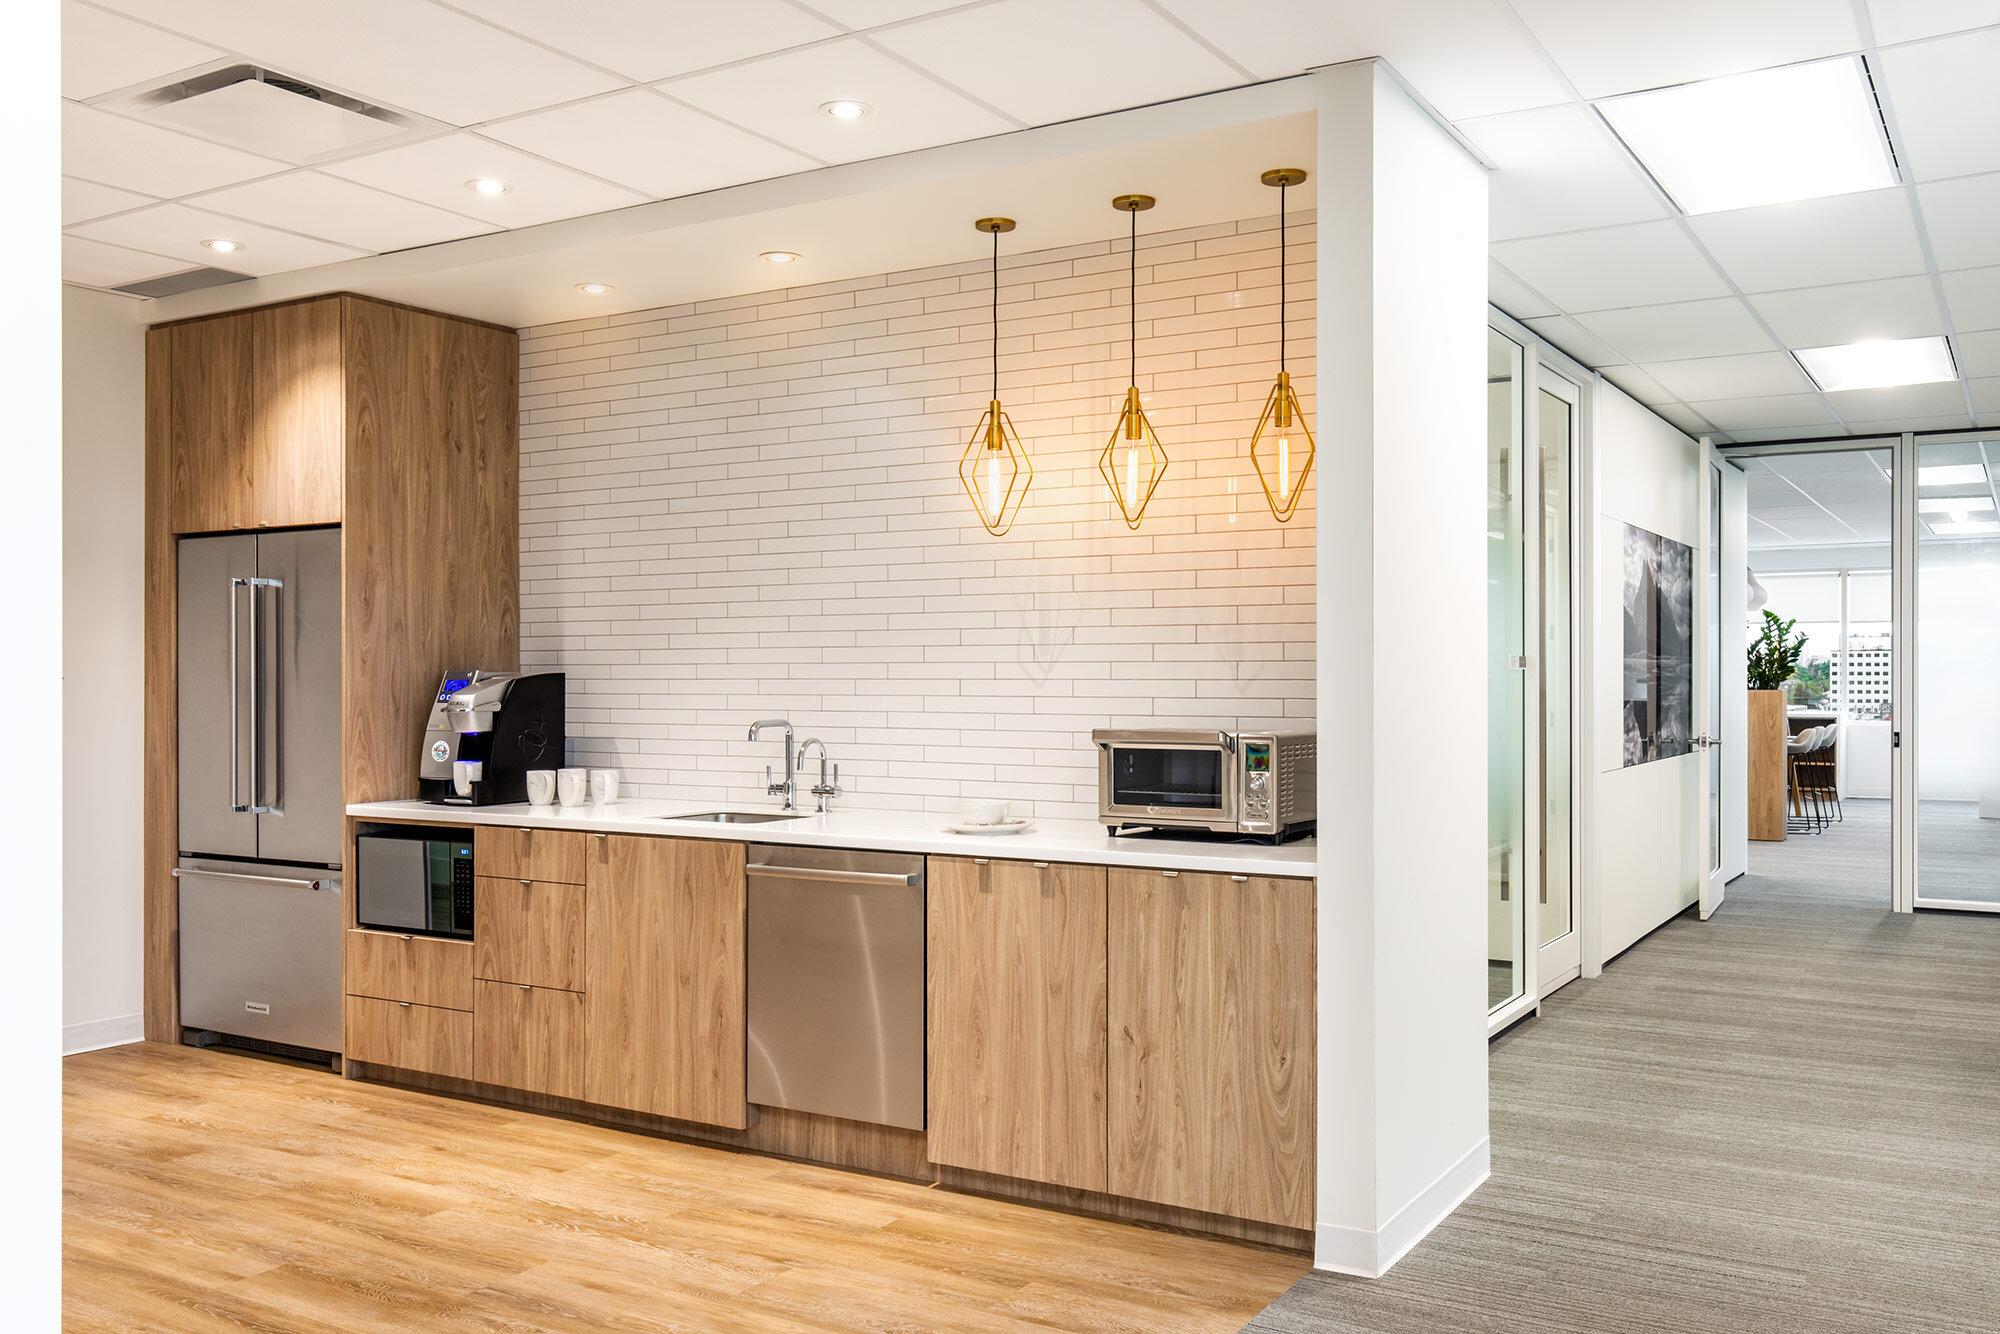 Insurance-interior-design-office-open-kitchen.jpg